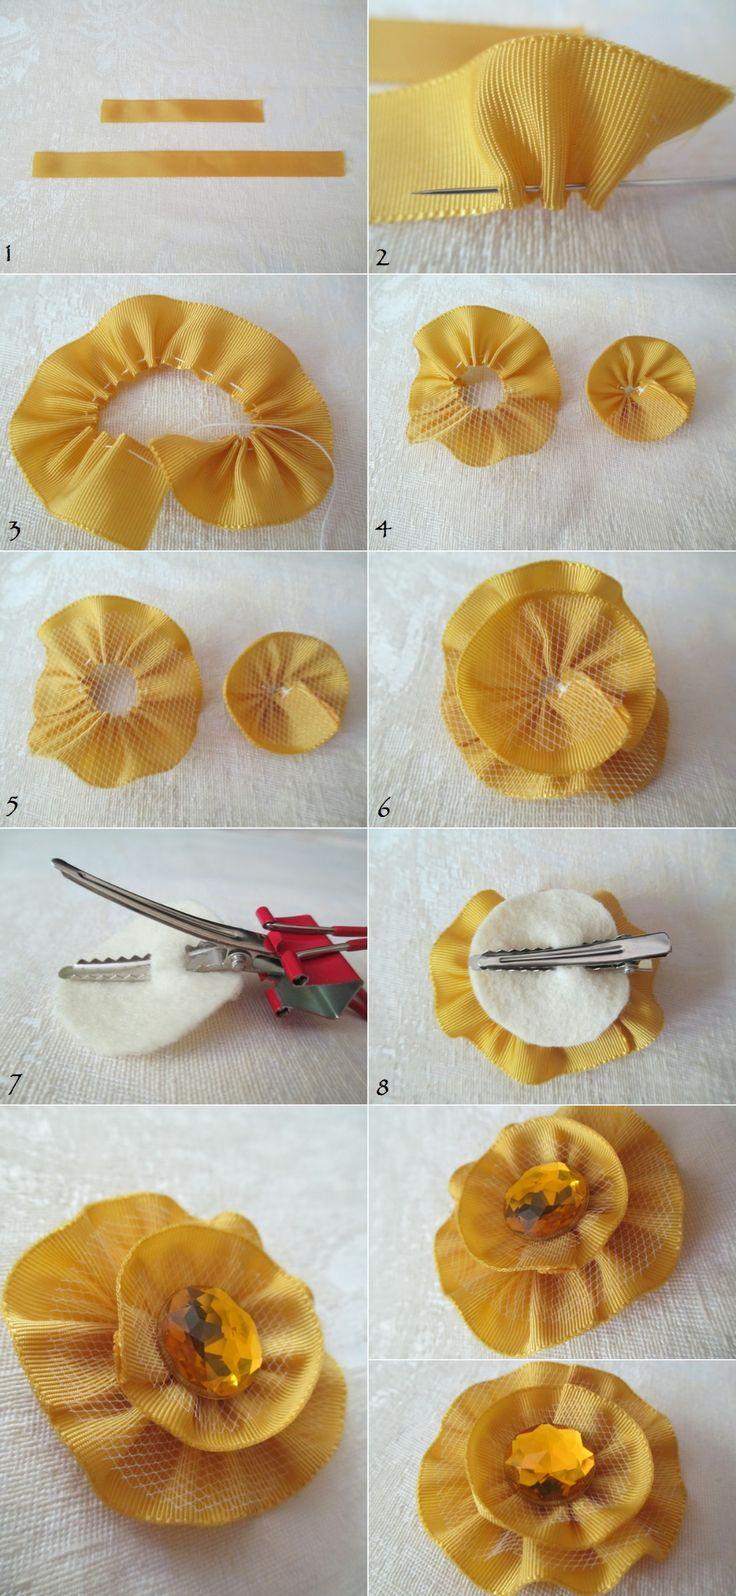 diy no sew ribbon flowers - photo #21